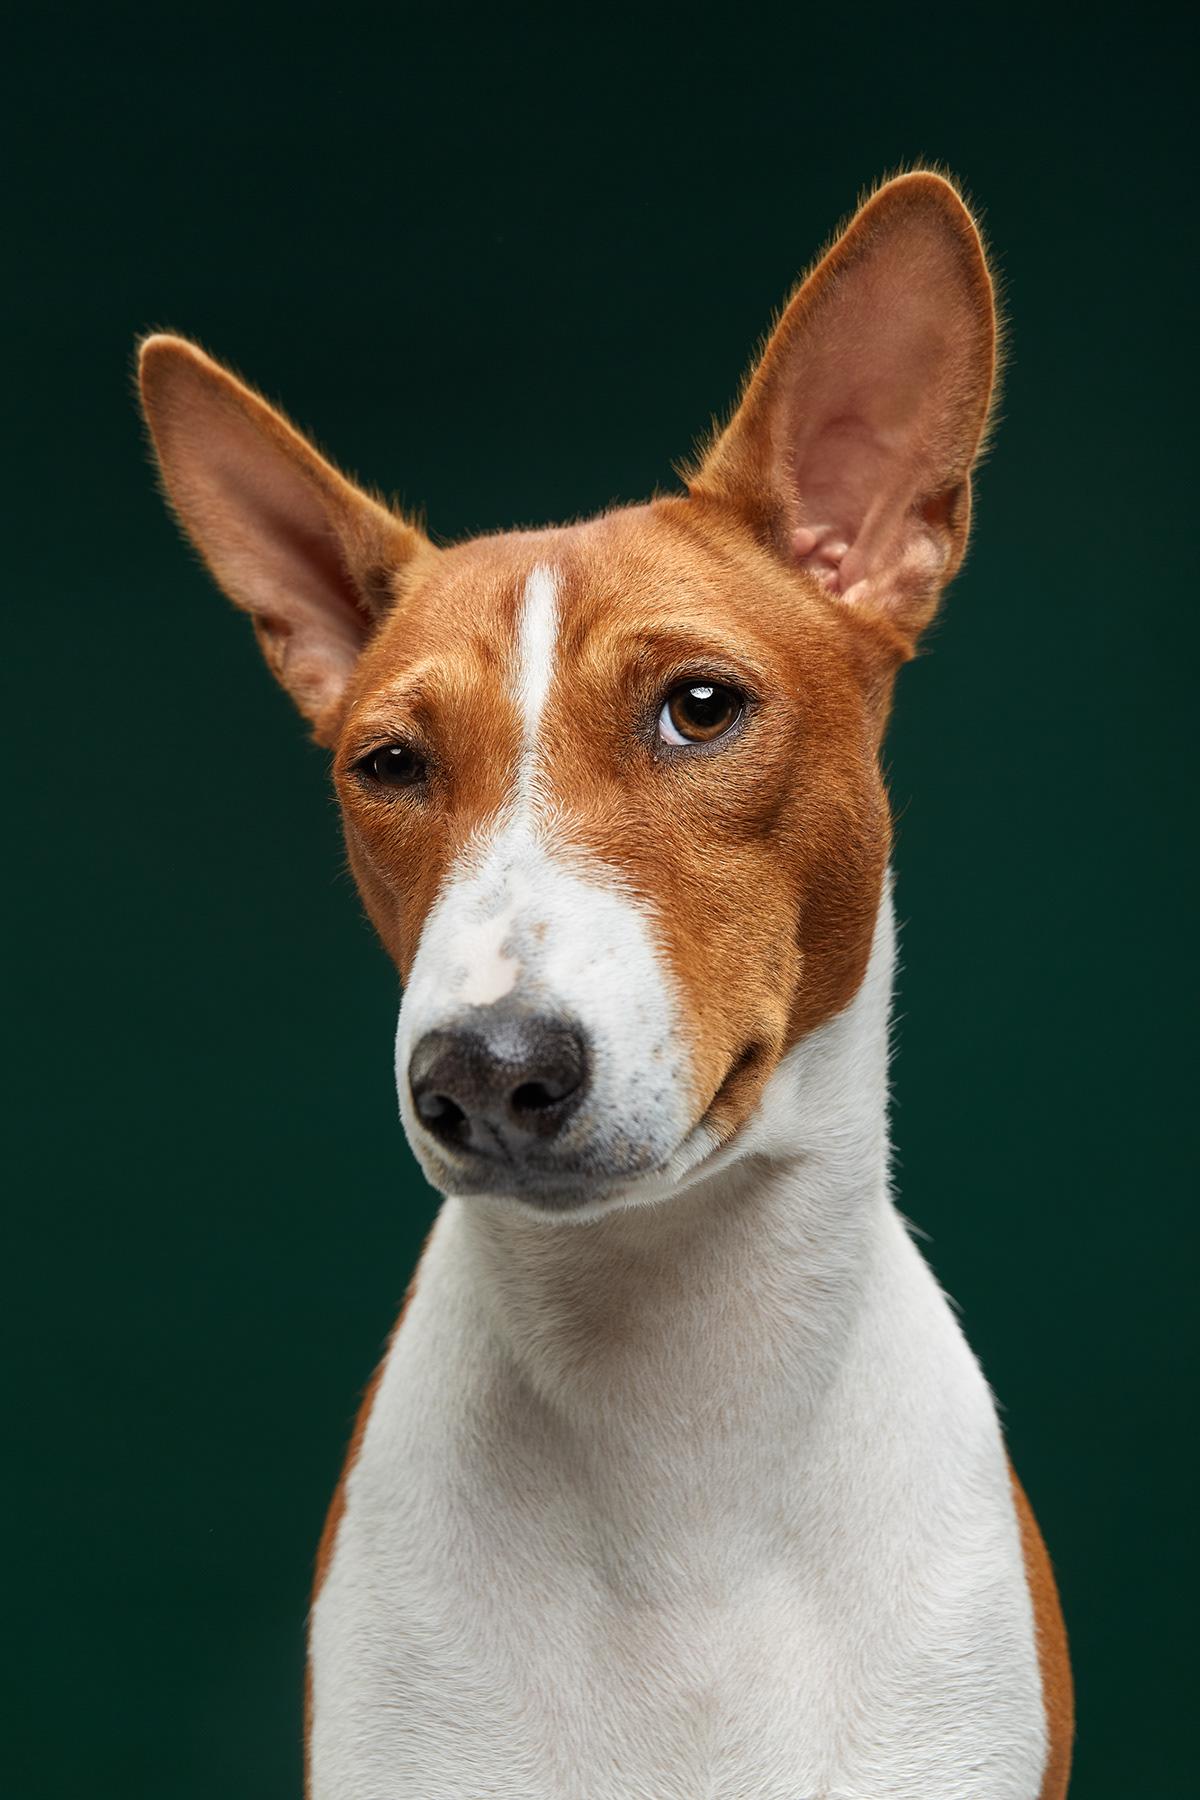 dogs dog photography dog breeds dog portrait the dog show